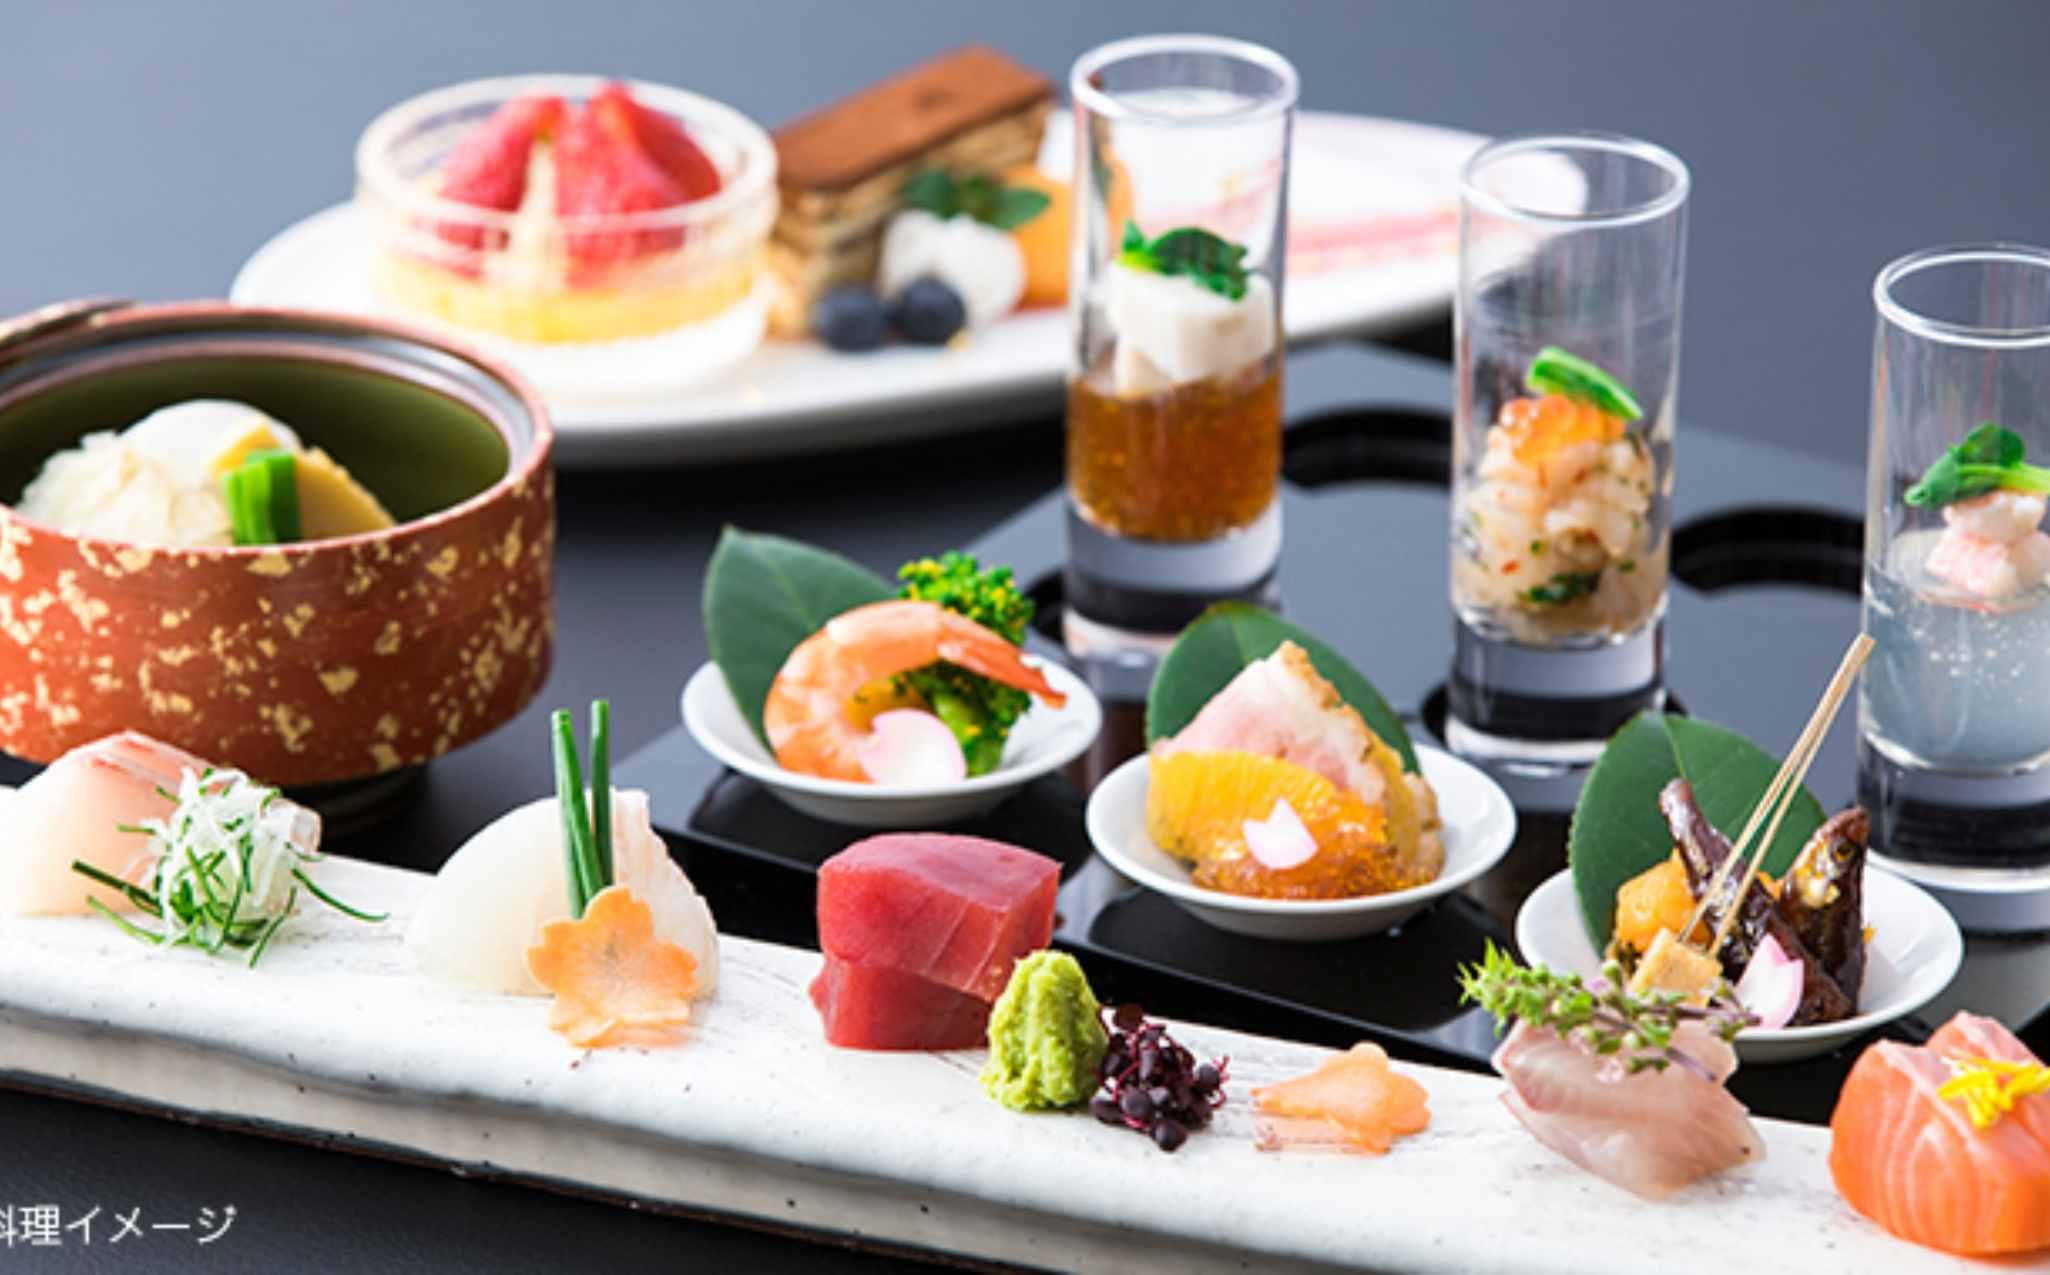 Konansou Ryokan Japanese Cuisine